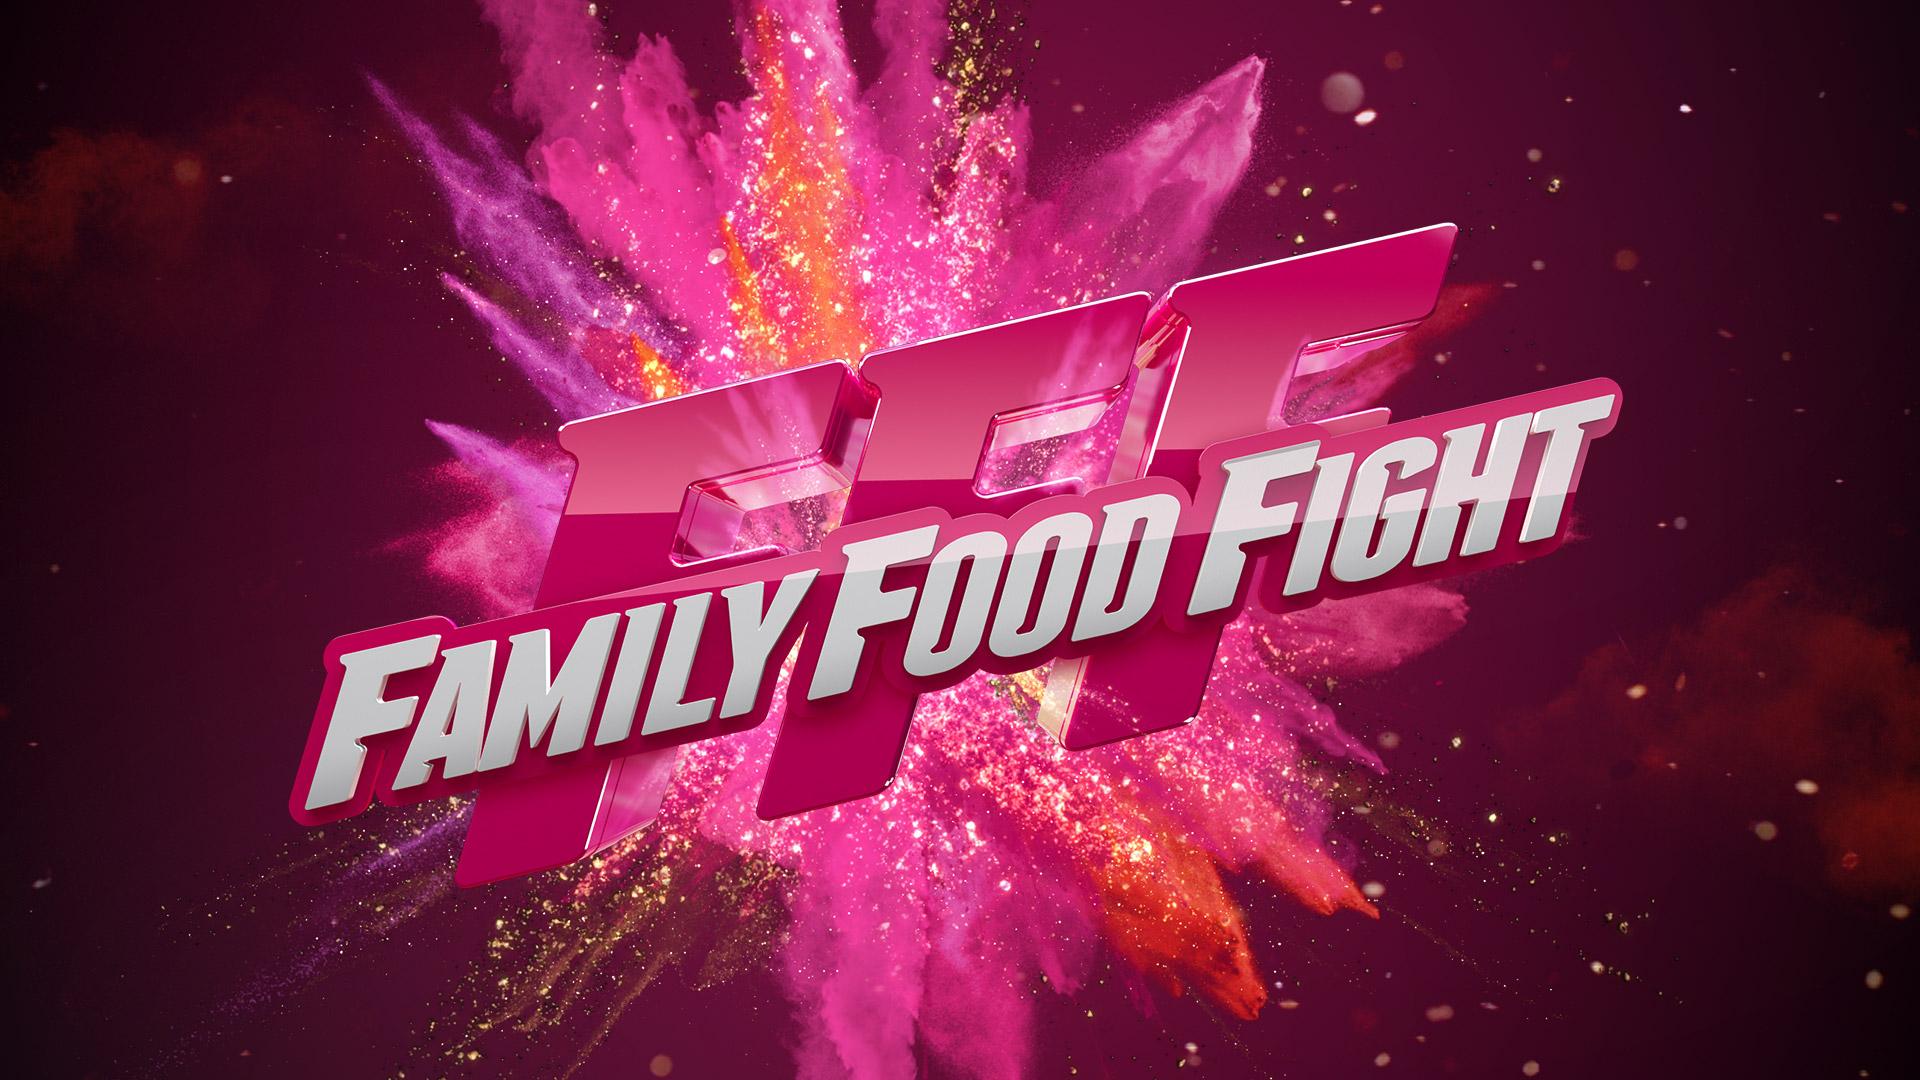 D08C9F00 7159 48F6 9297 1183Dc193Cb4 Rtp Prepara Versão Portuguesa De «Family Food Fight»